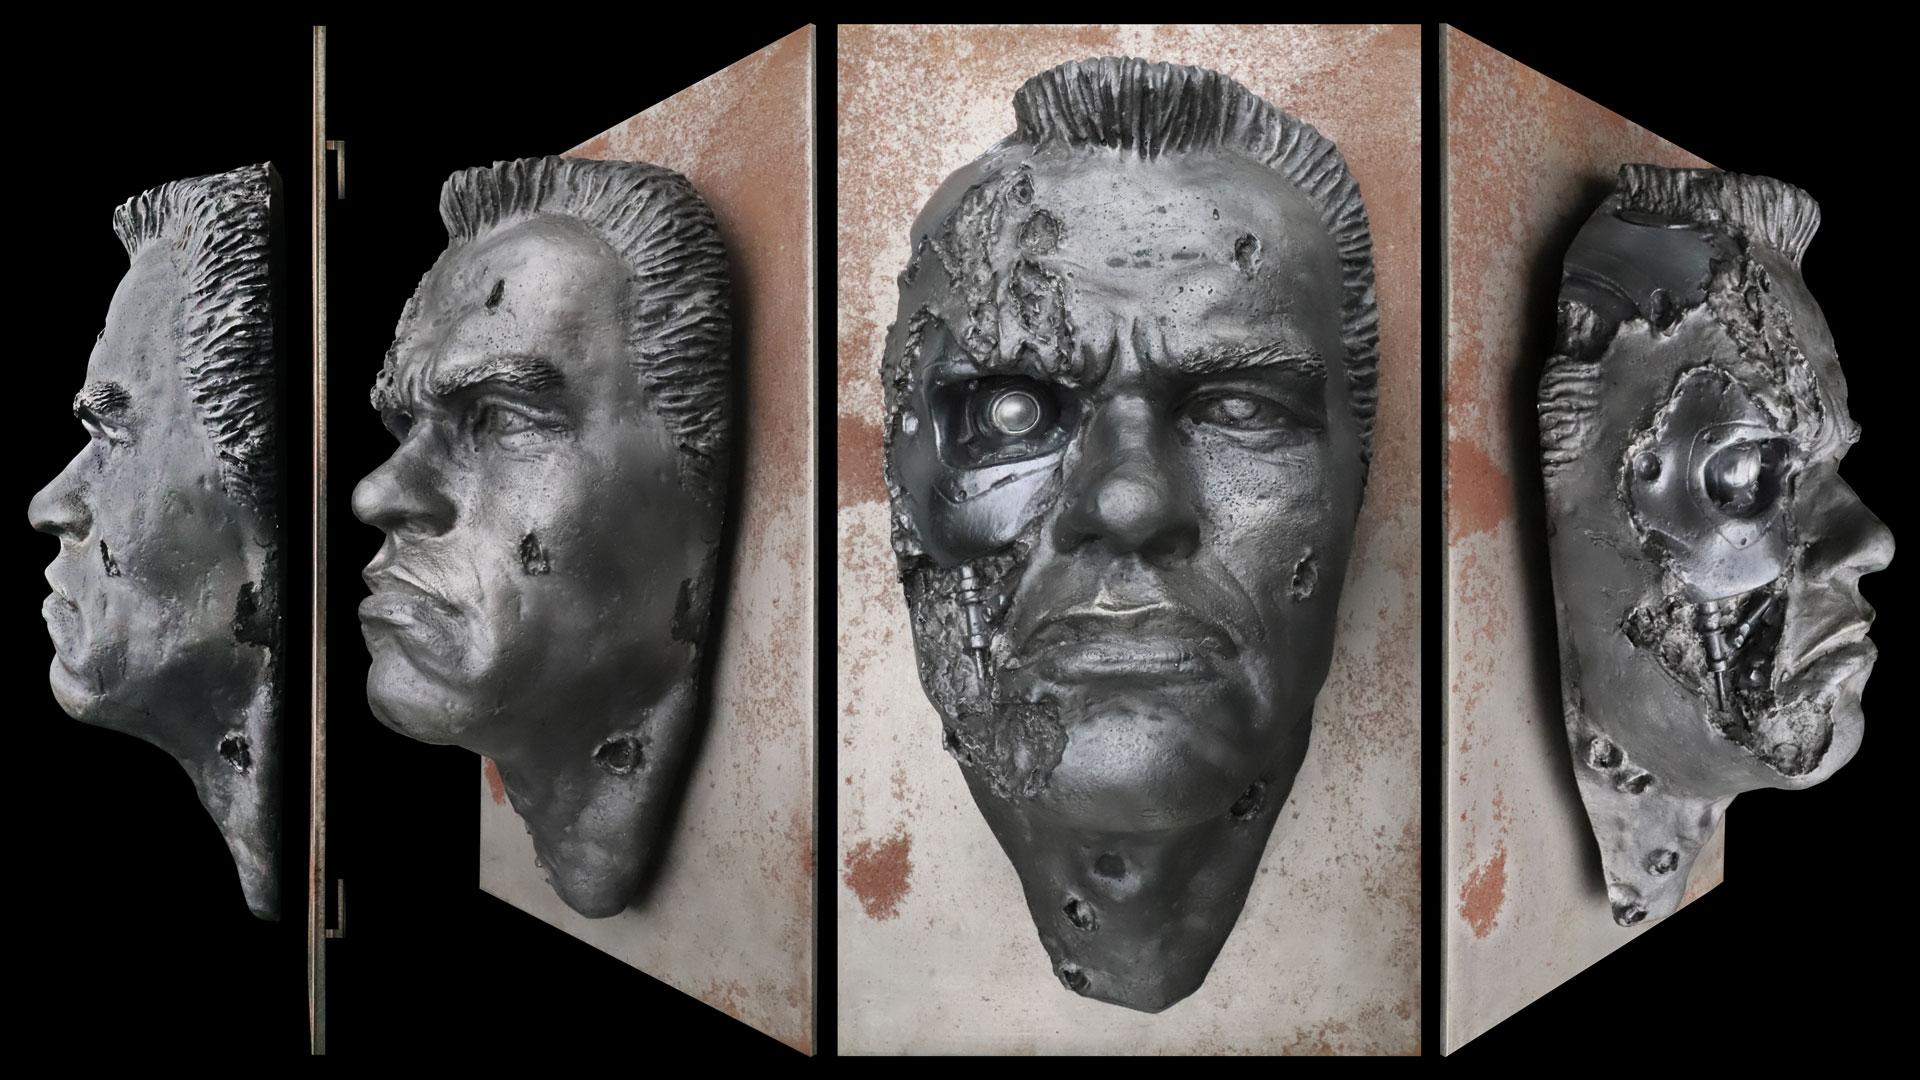 Arnold Schwarzenegger T-800 Terminator Livesize Face.